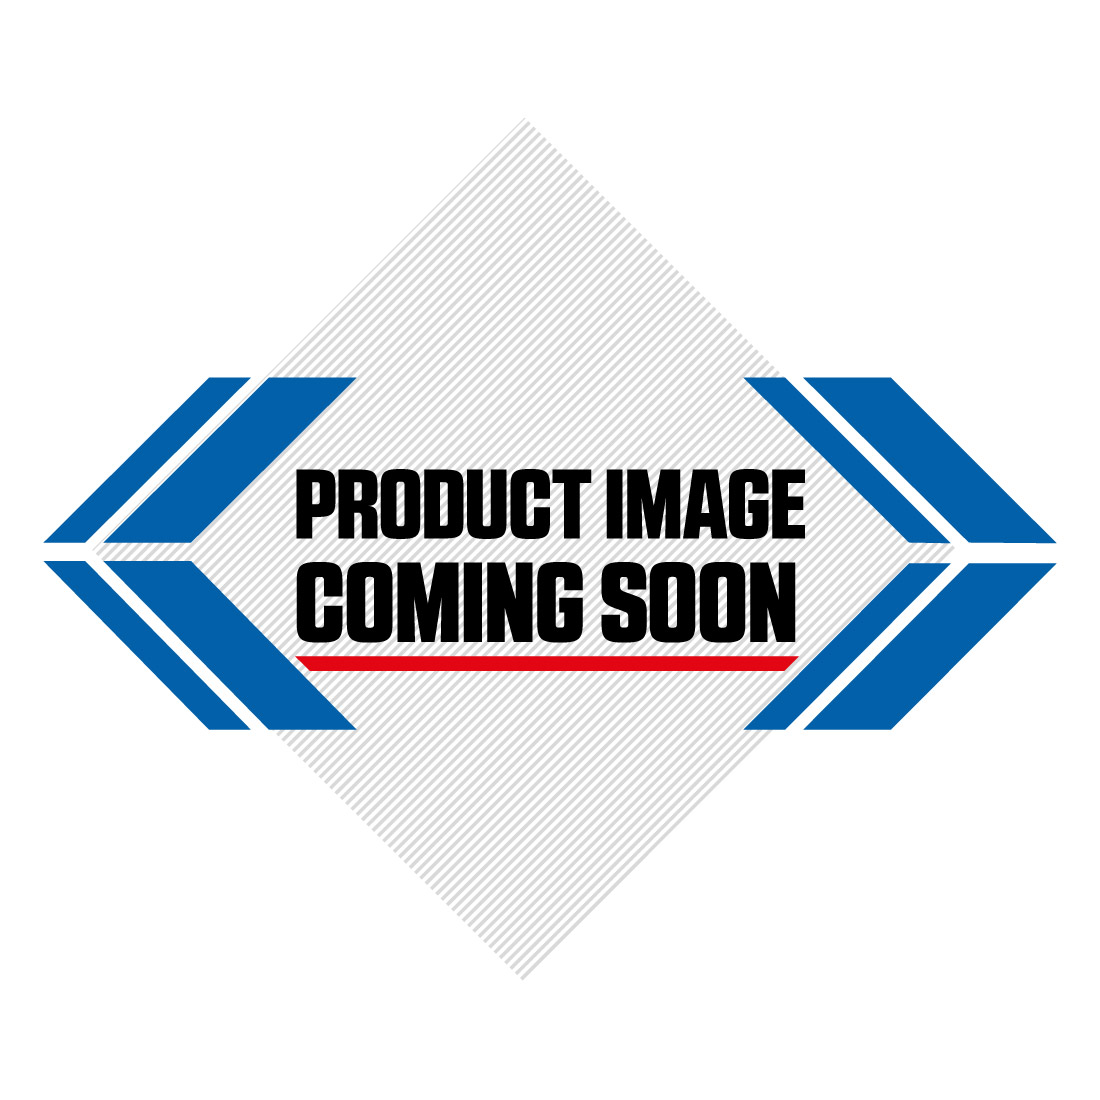 DJI Mavic Pro Platinum Drone Image-3